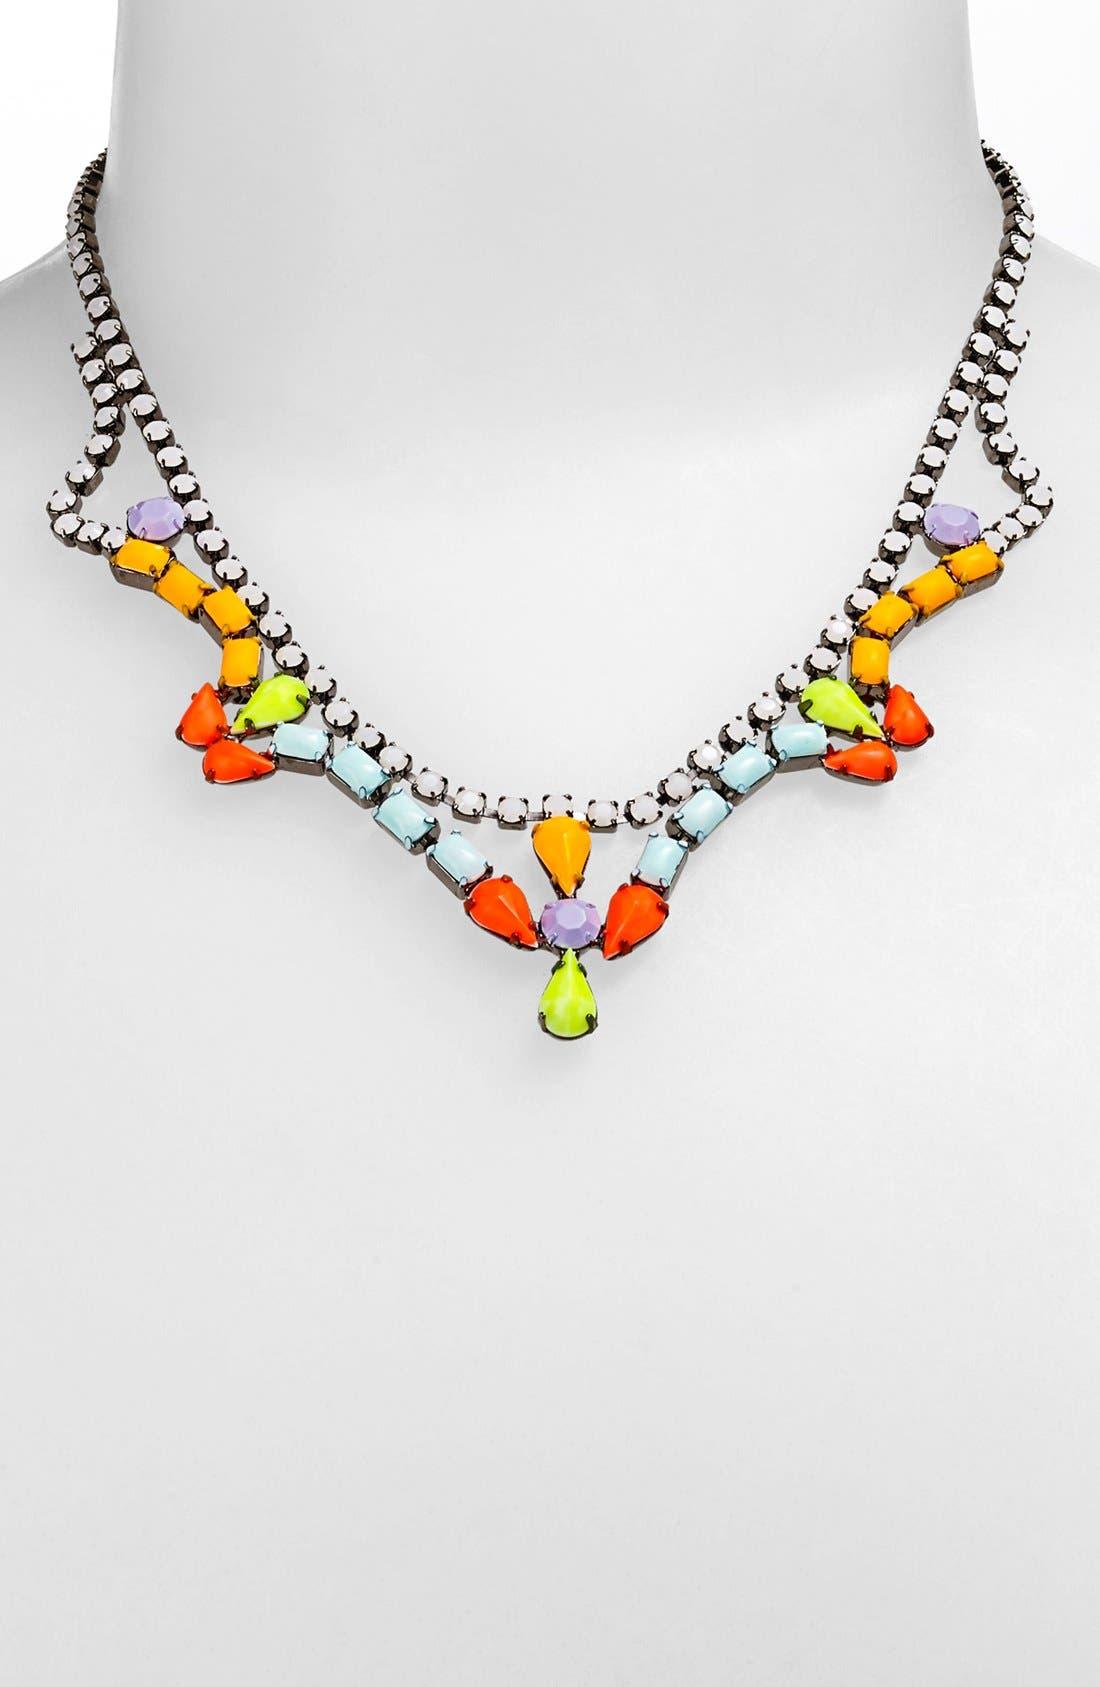 Alternate Image 1 Selected - Tom Binns 'Shadow Play' Necklace